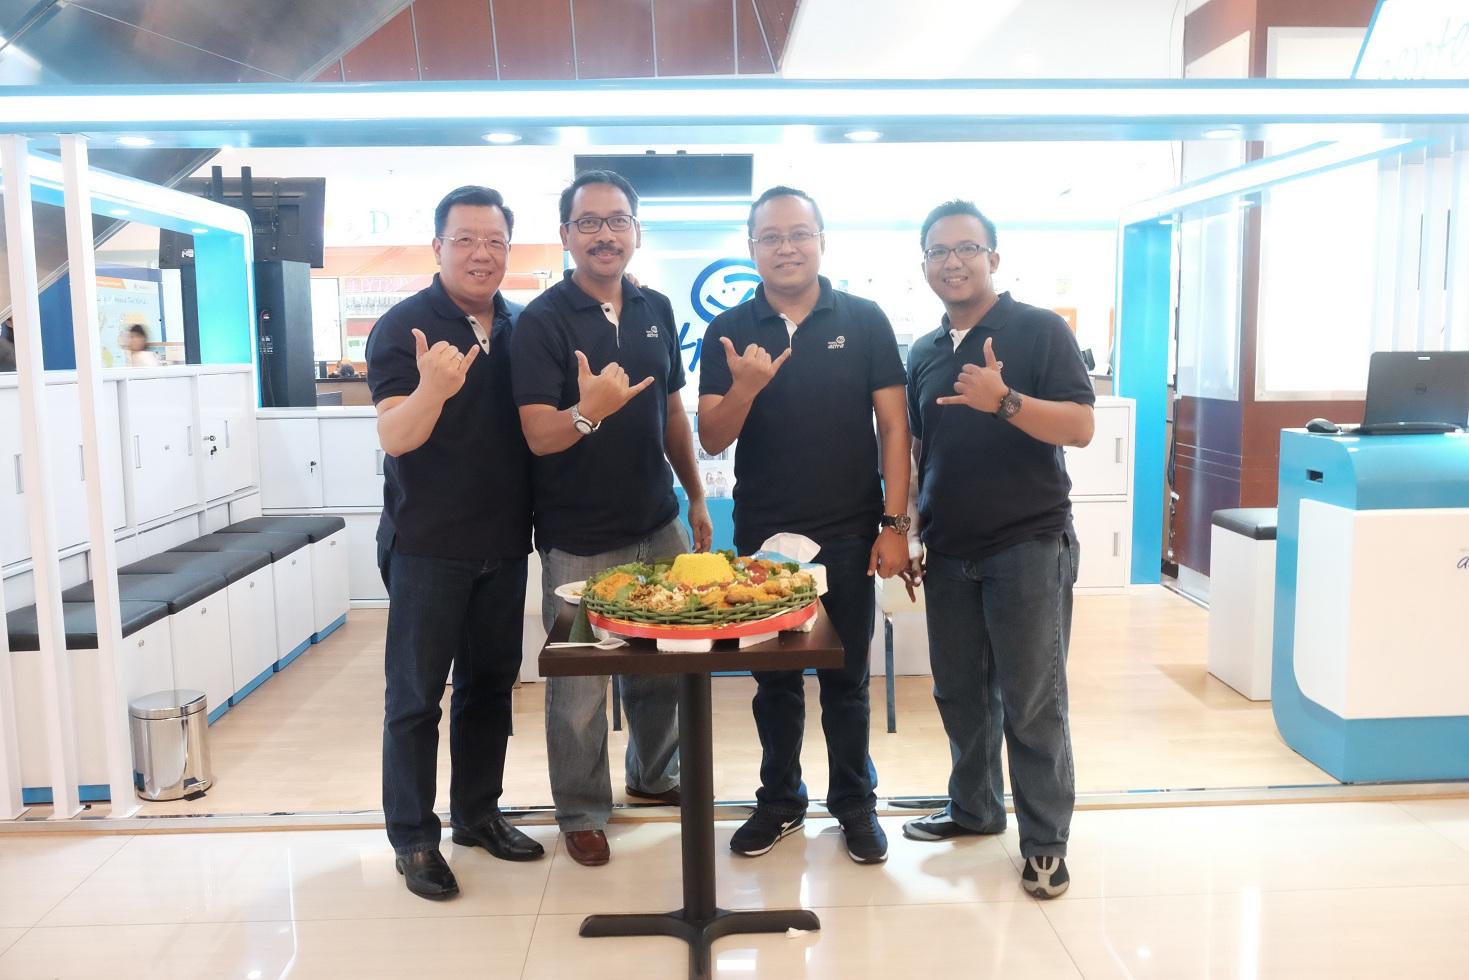 Chief Marketing Officer Retail Business Asuransi Astra - Gunawan Salim (kiri) beserta manajemen Asuransi Astra pada saat pembukaan Garda Center Pontianak